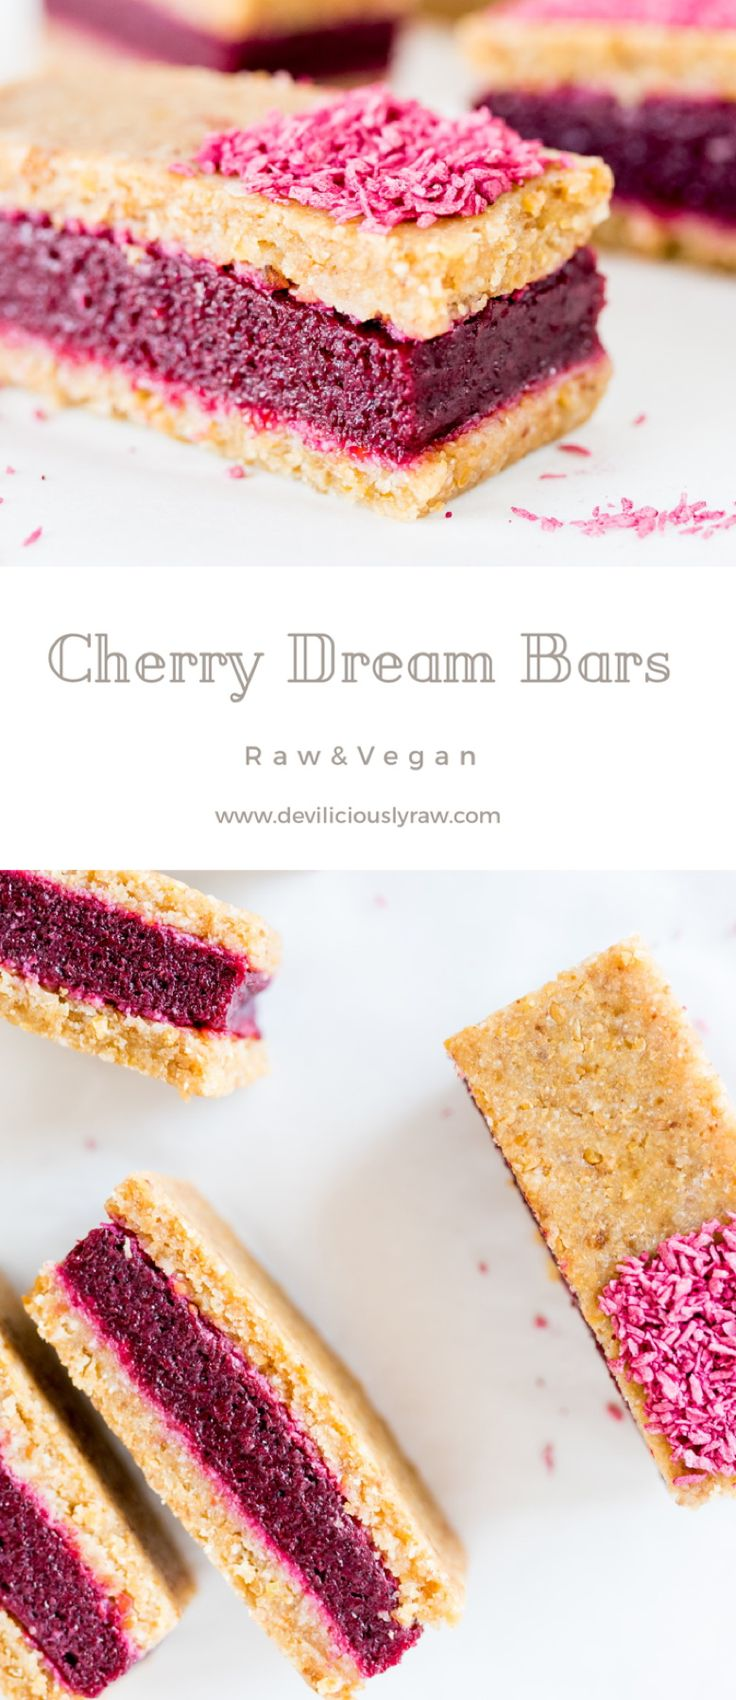 #raw #vegan Cherry Dream Bars from Deviliciously Raw